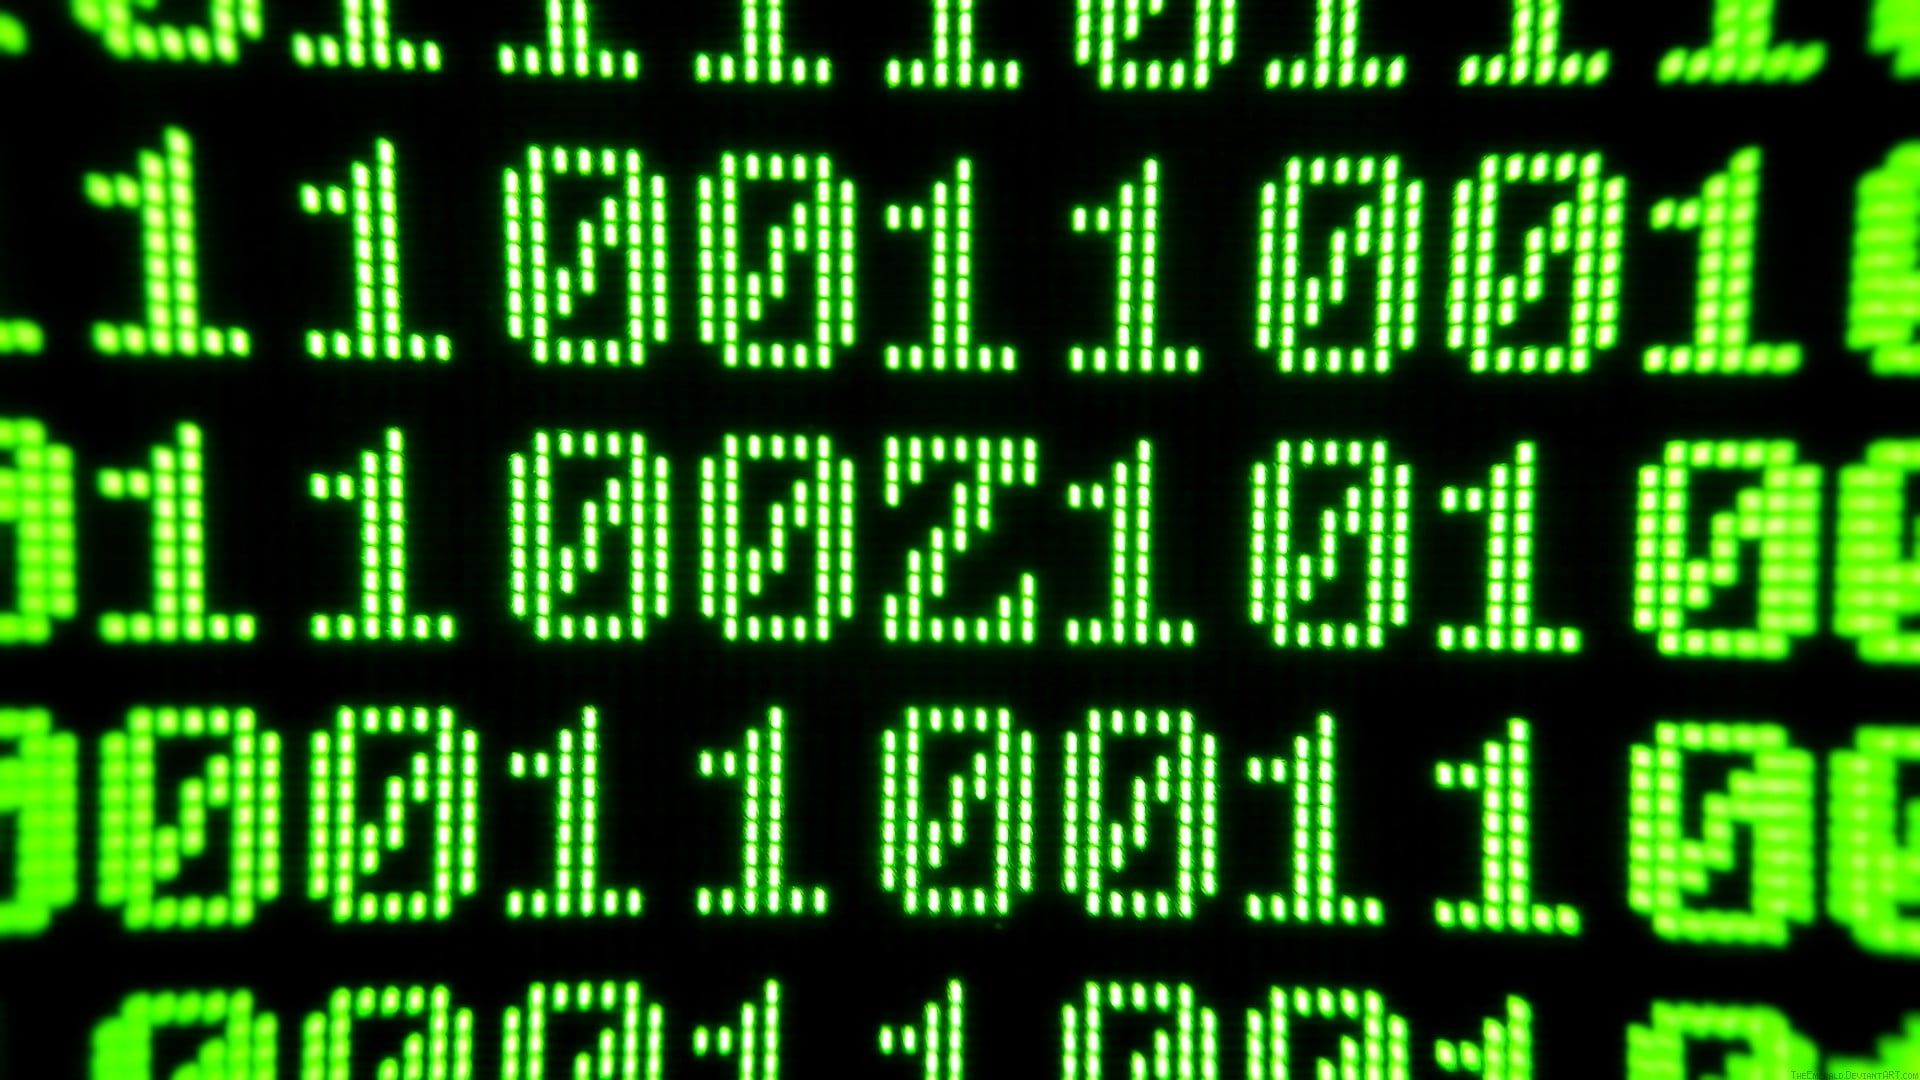 Green And Black Number Codes Green Black Contrast The Matrix Pixels Binary Code Computer 1080p Code Wallpaper Iphone Wallpaper Green Samsung Wallpaper